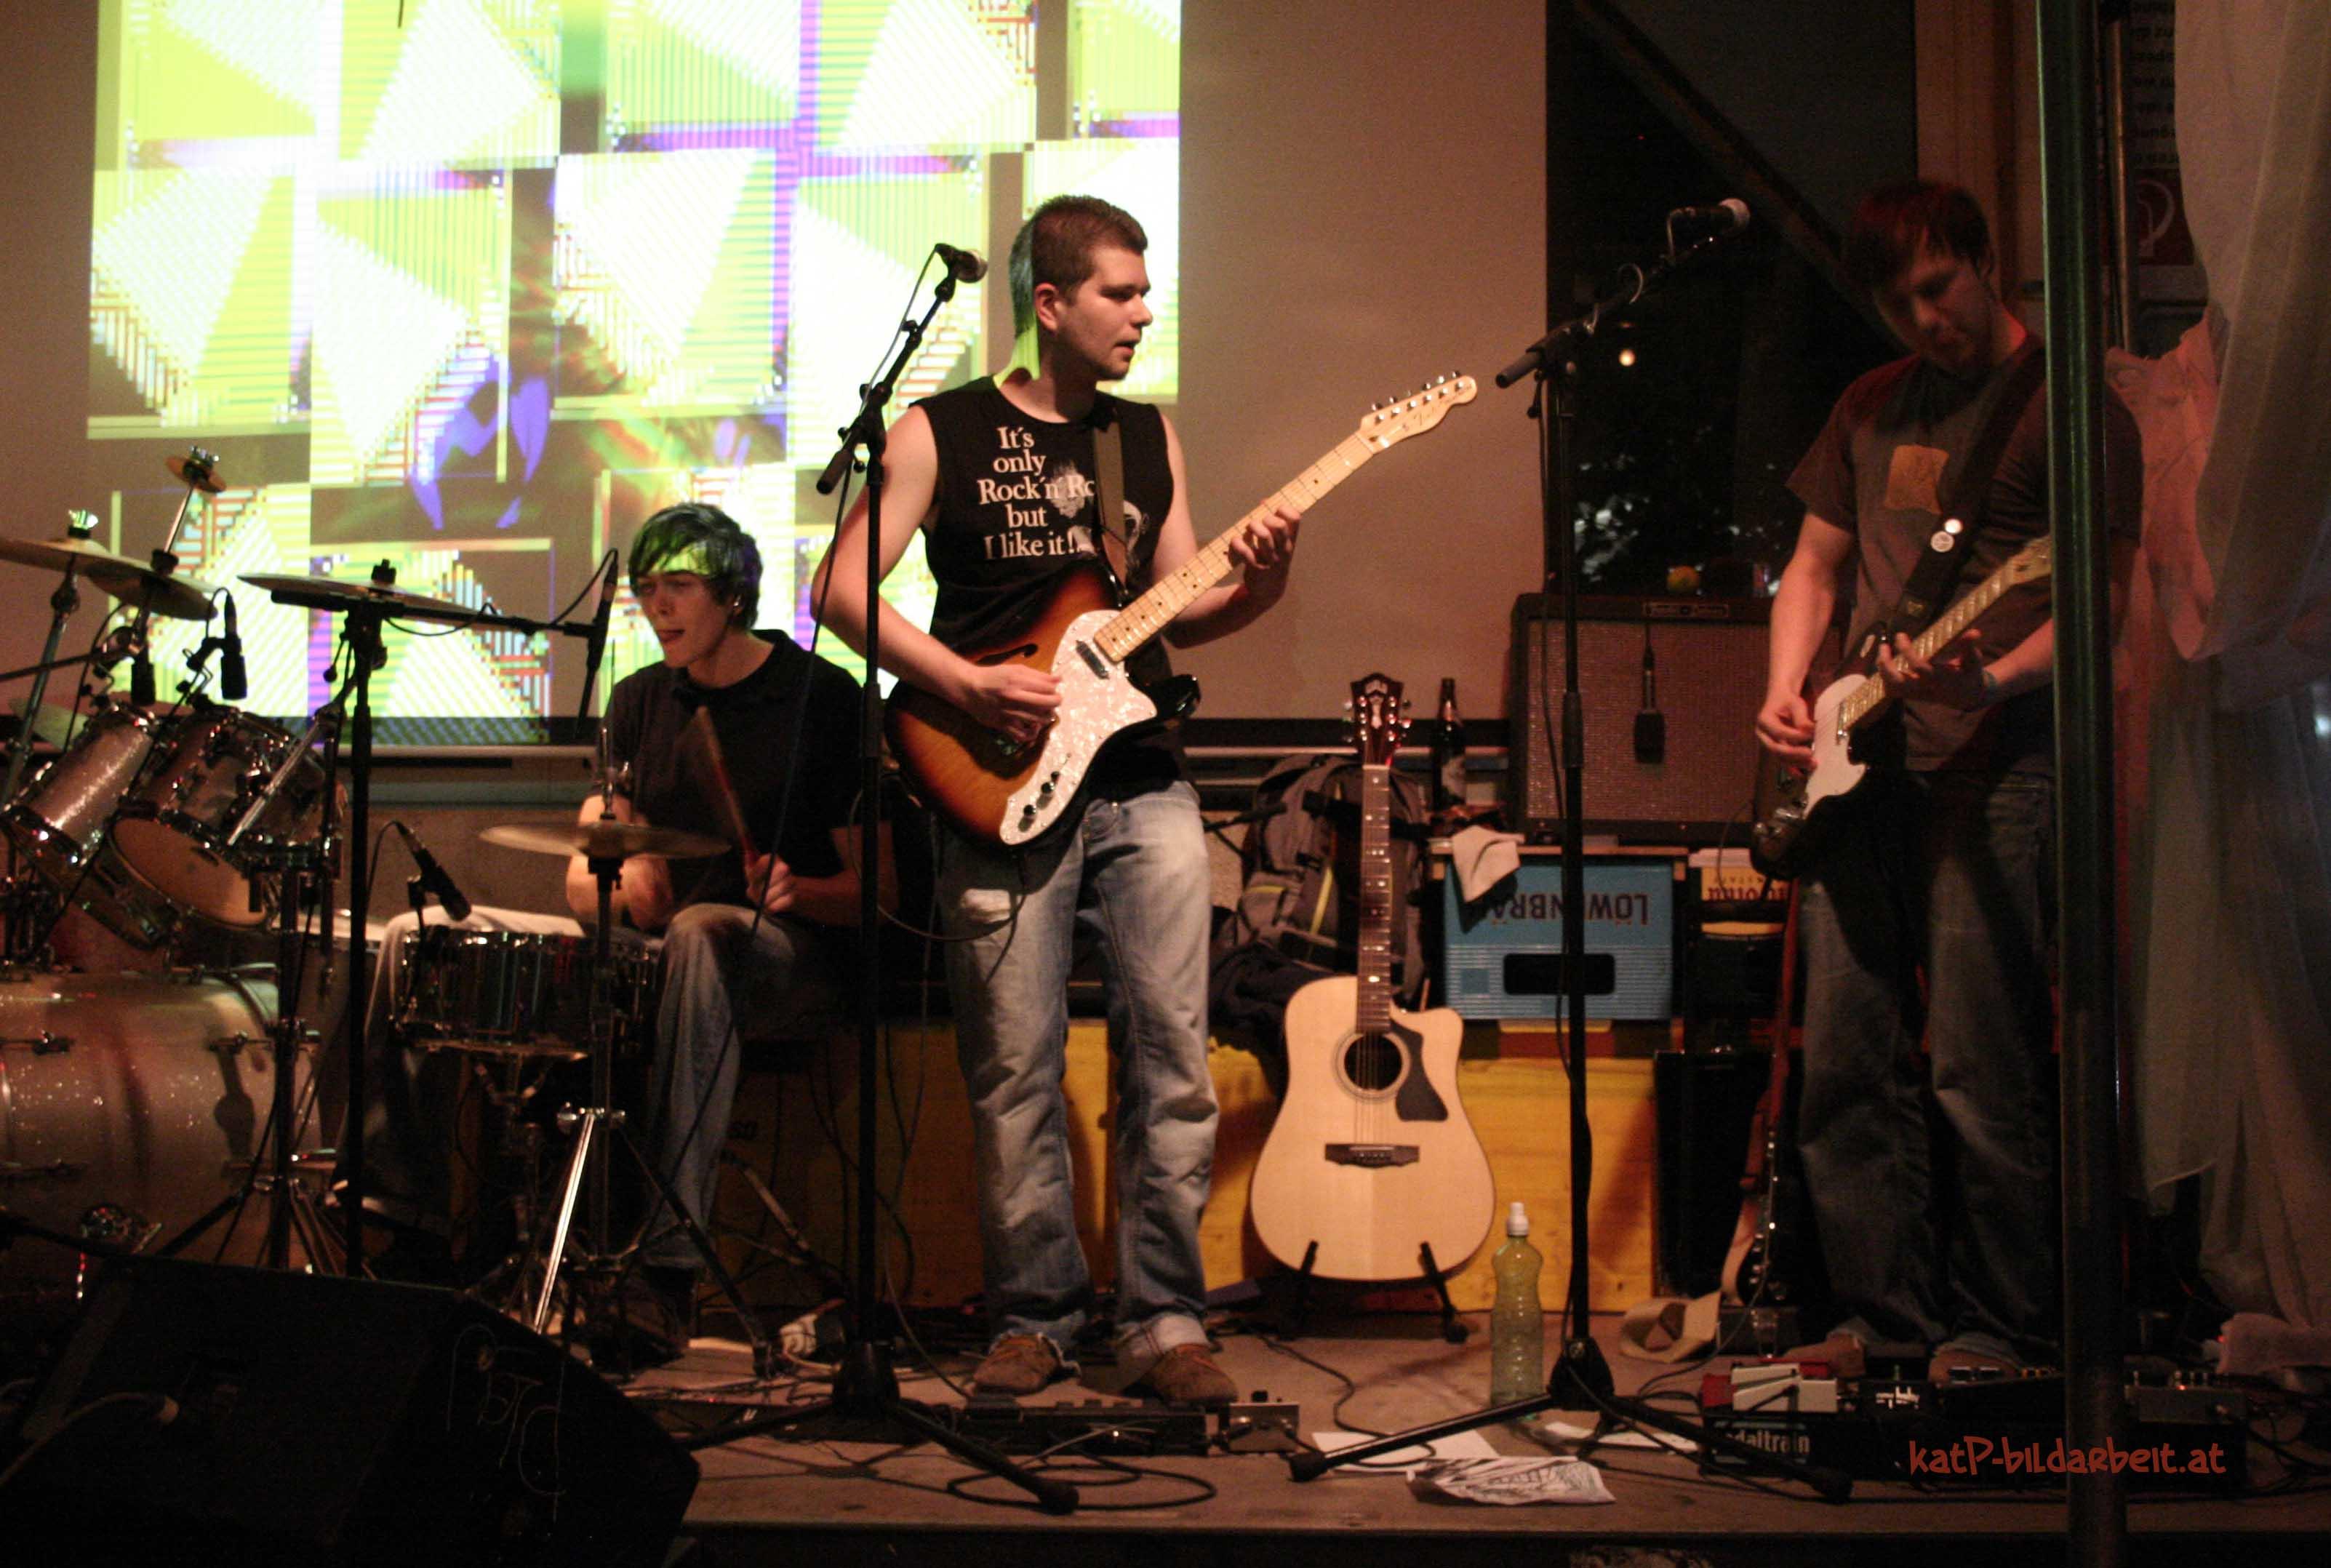 2 2010FlucGigArtWerk guitarsSoundDiary by katP.jpg